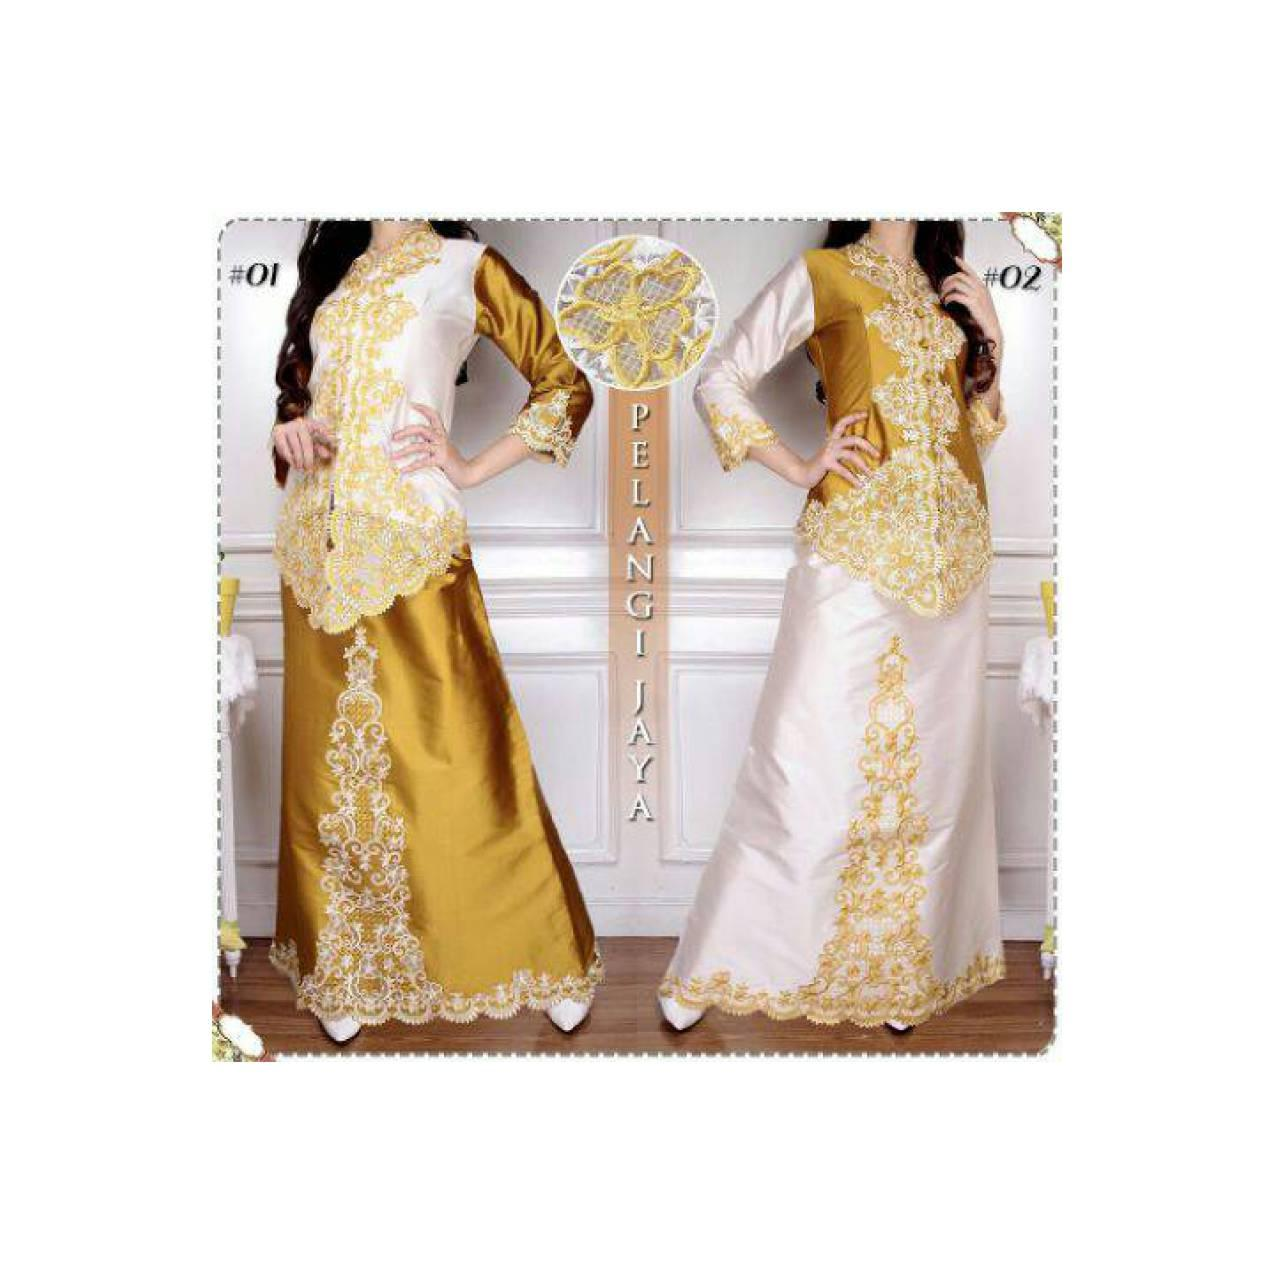 Abaya Baju Kebaya Modern Busana Wanita Gaun Pesta Muslim Gamis